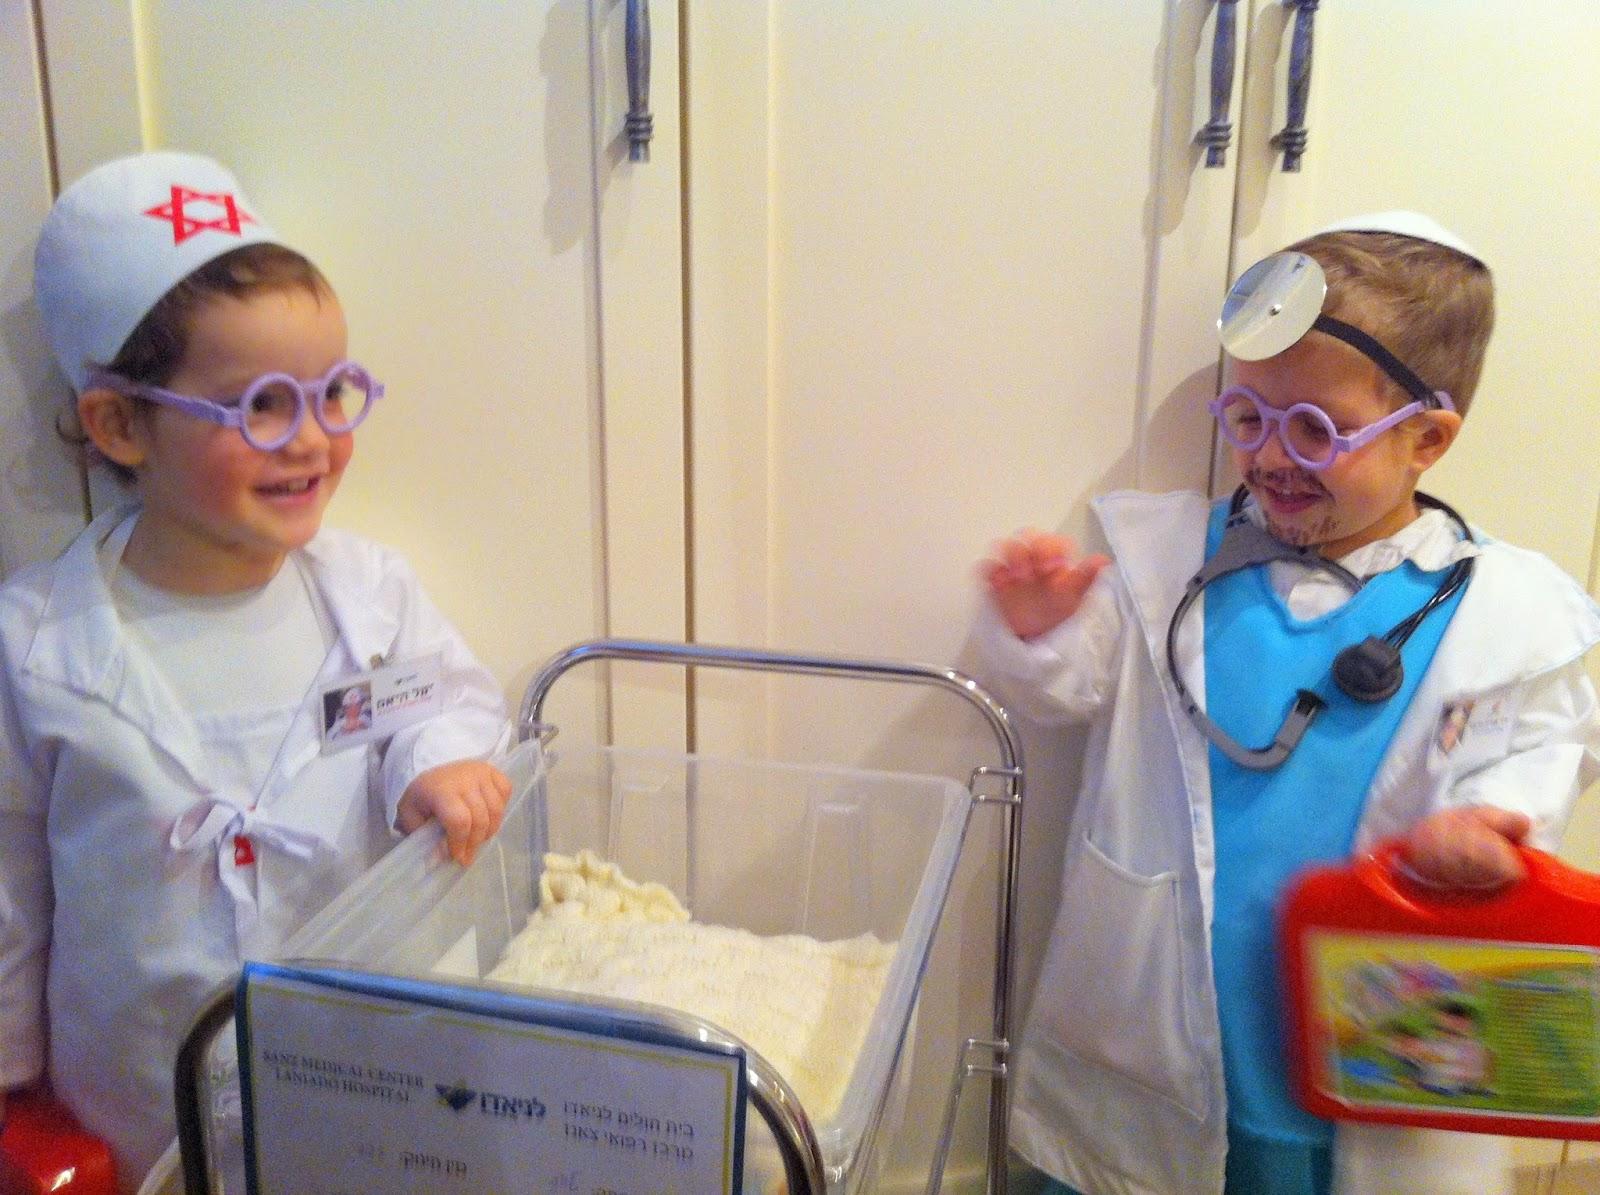 IMG 5321 - התחפשנו לרופאים!!!